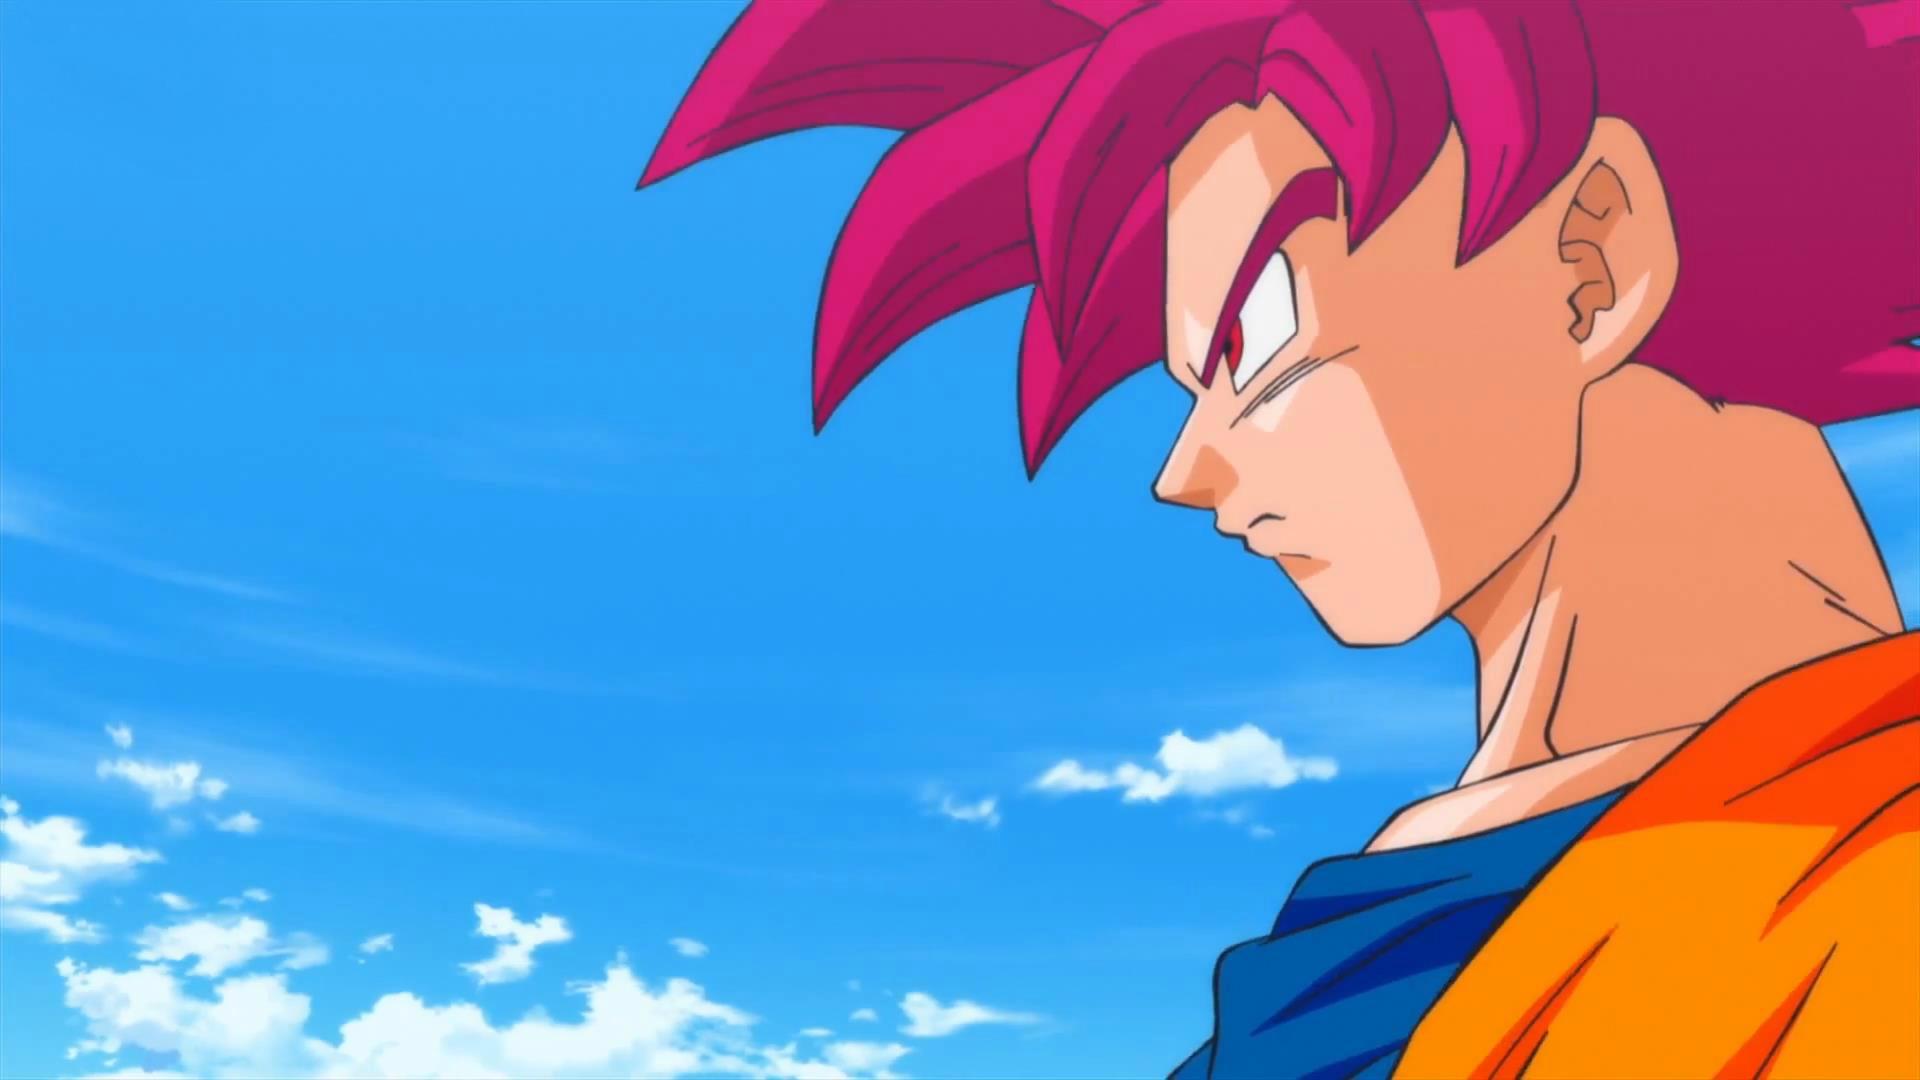 Goku Hd Wallpapers 1080p Bills Vs Goku Ssj God 1269177